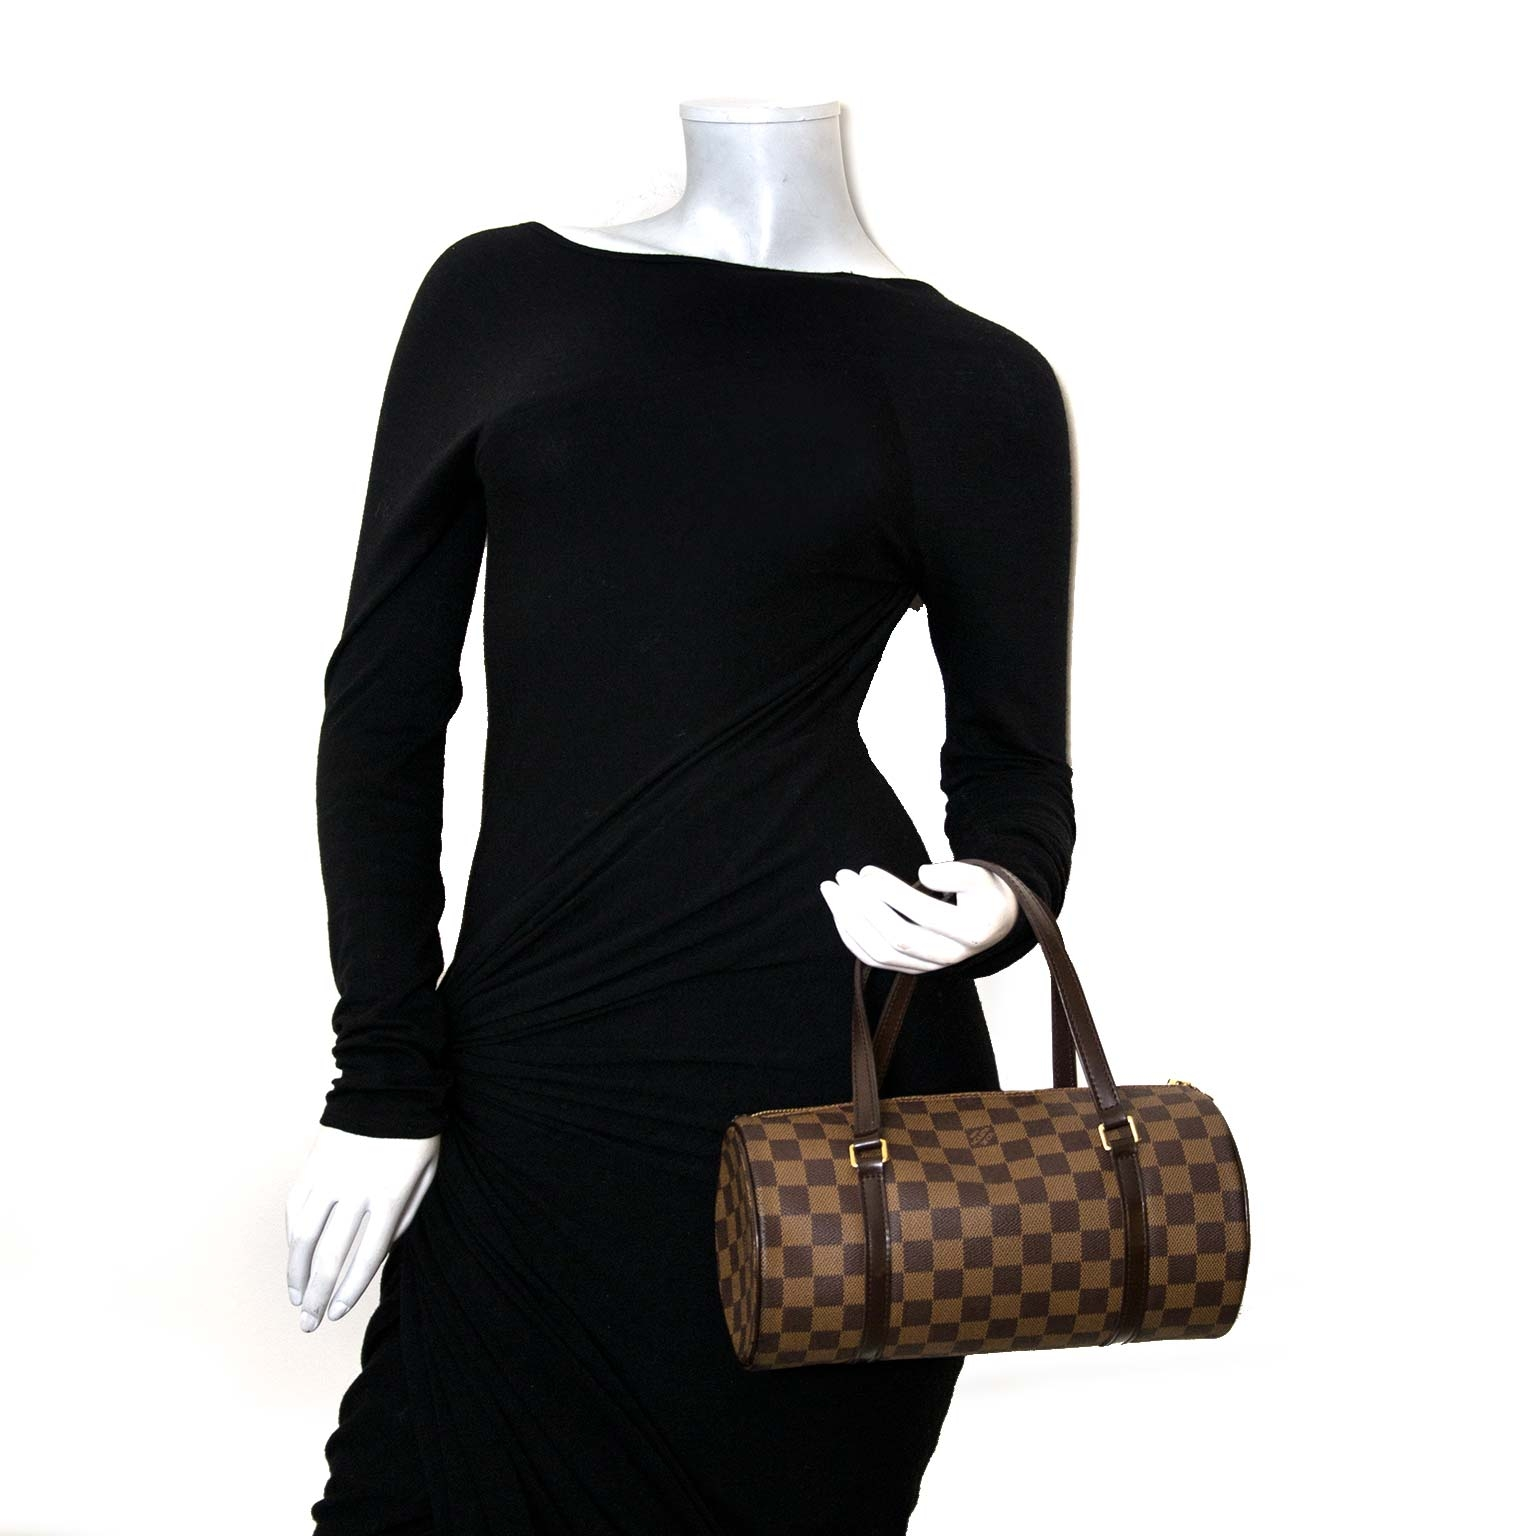 shop safe online Delvaux Multicolor Toile De Cuir Crossbody Bag